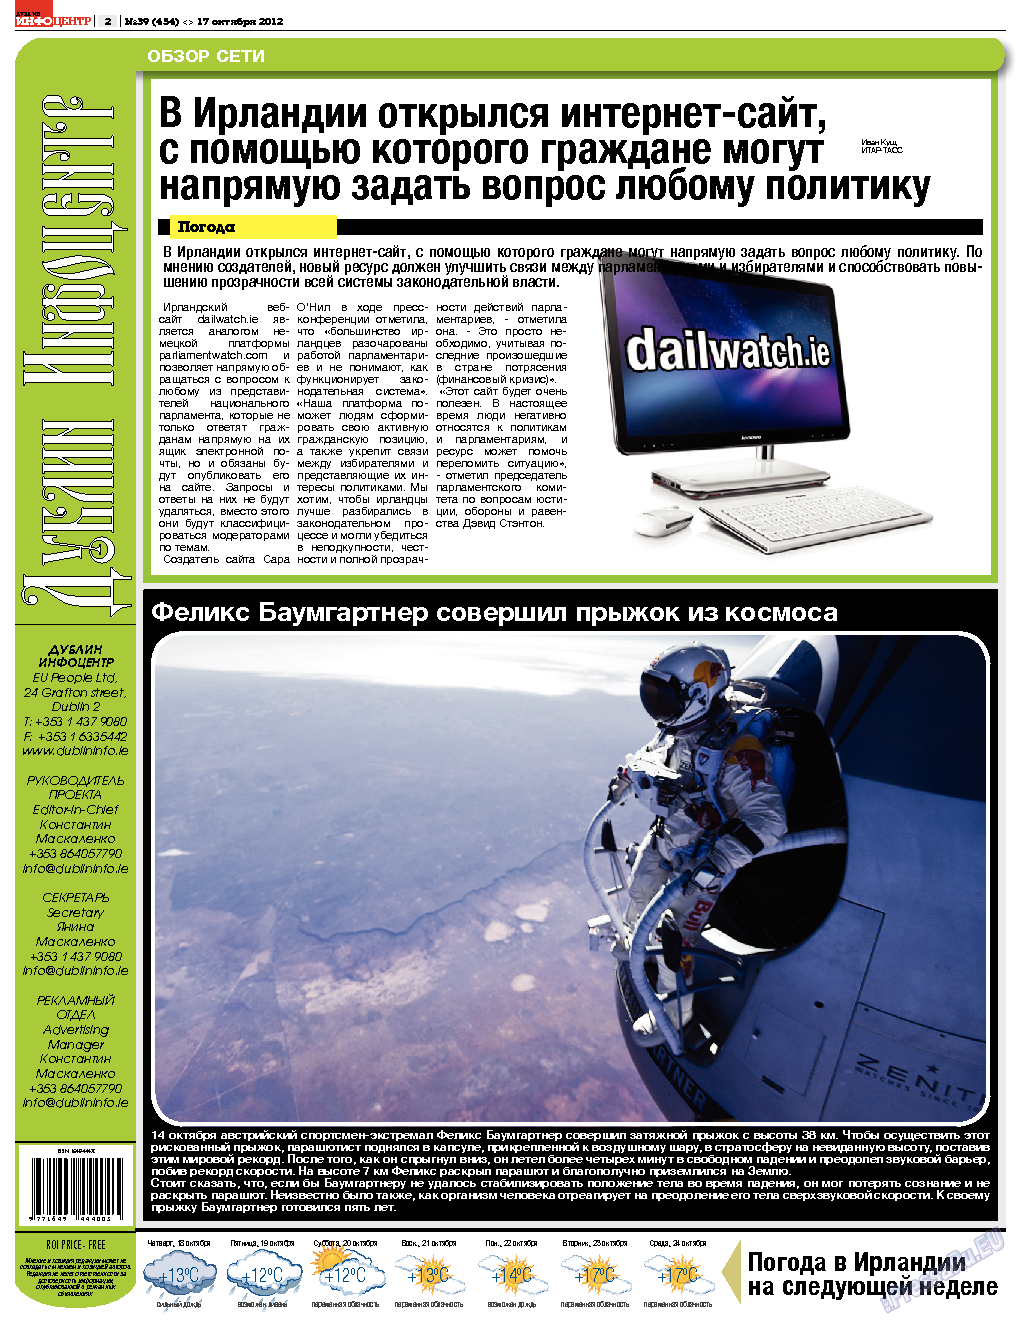 Дублин инфоцентр (газета). 2012 год, номер 38, стр. 2